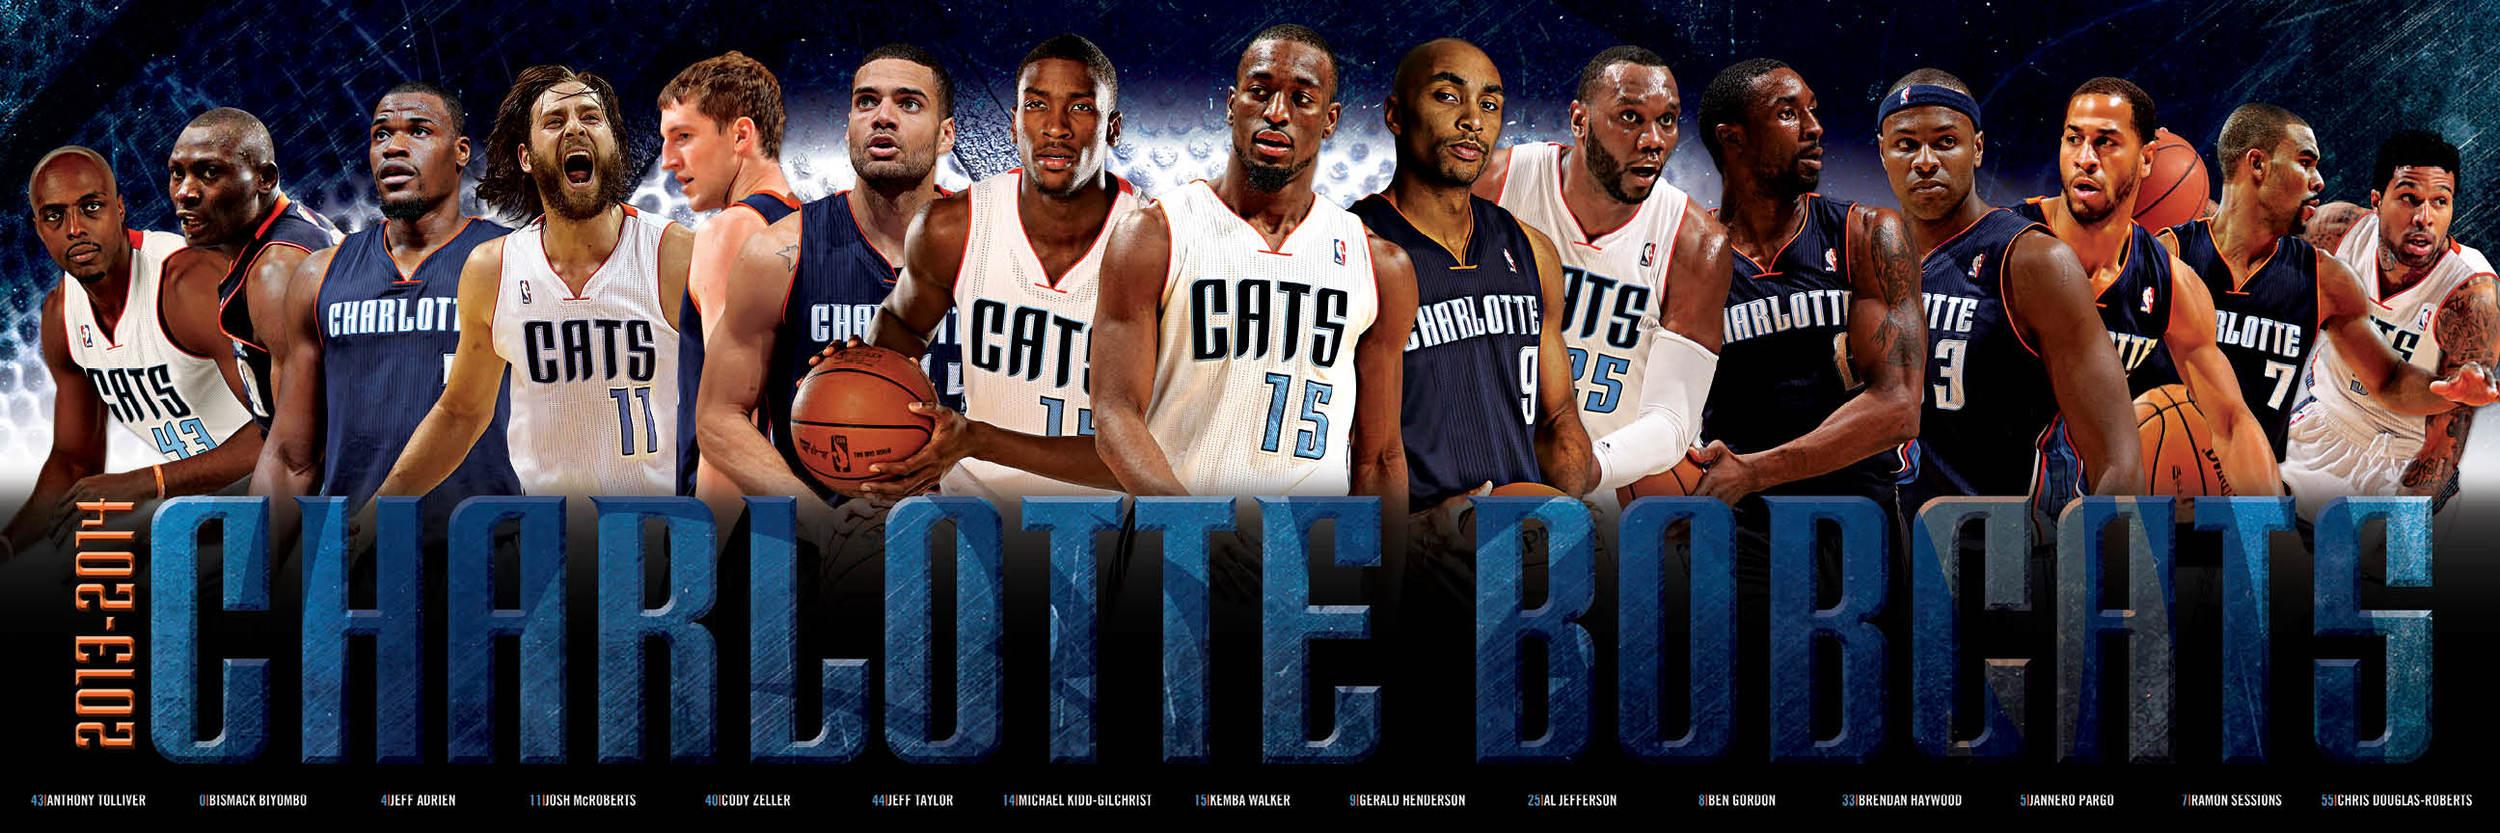 Charlotte Bobcats Team Poster